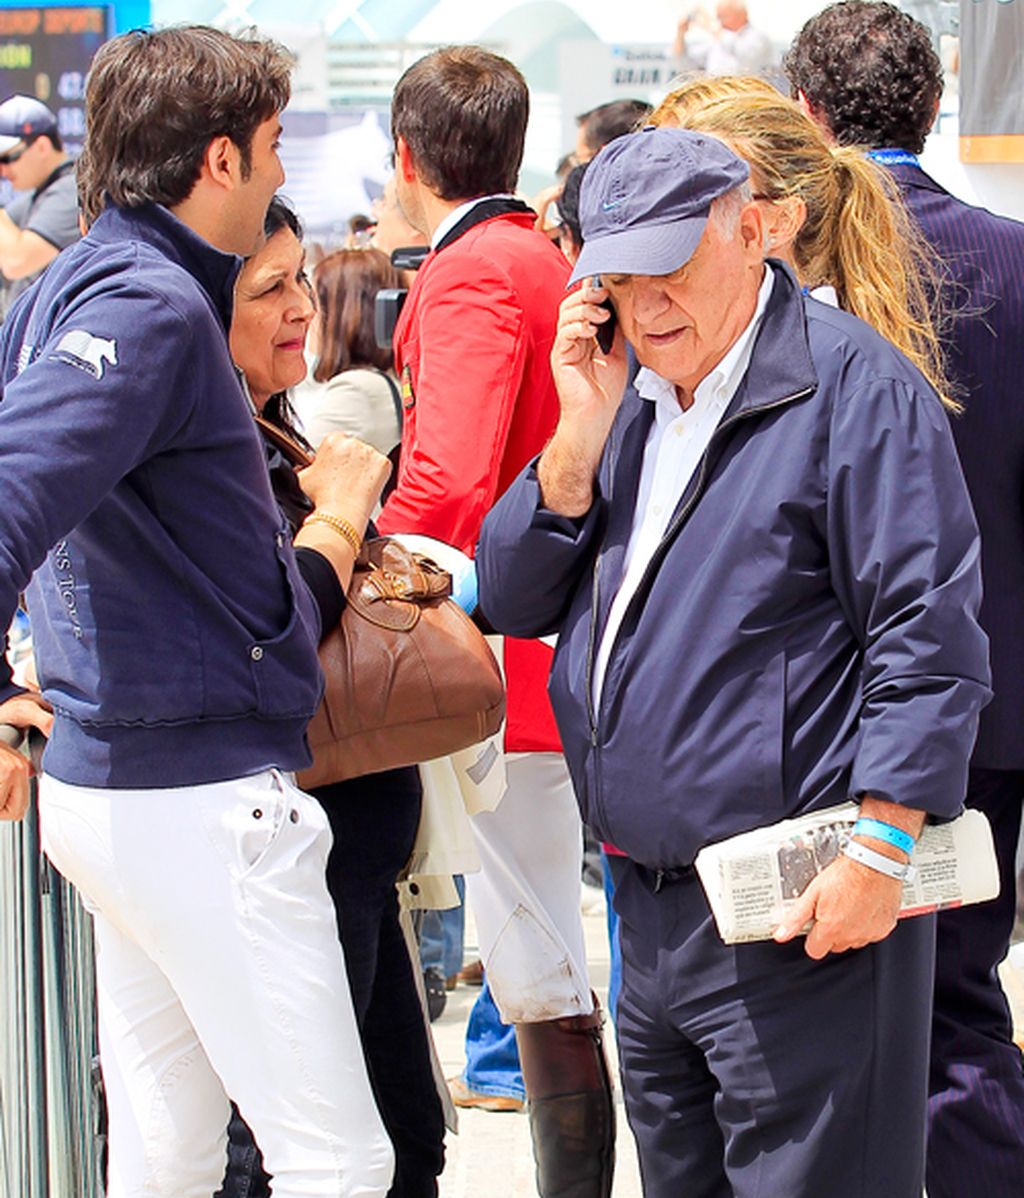 Marta Ortega, Carlota Casiraghi y Ahtina Onassis: herederas en Valencia